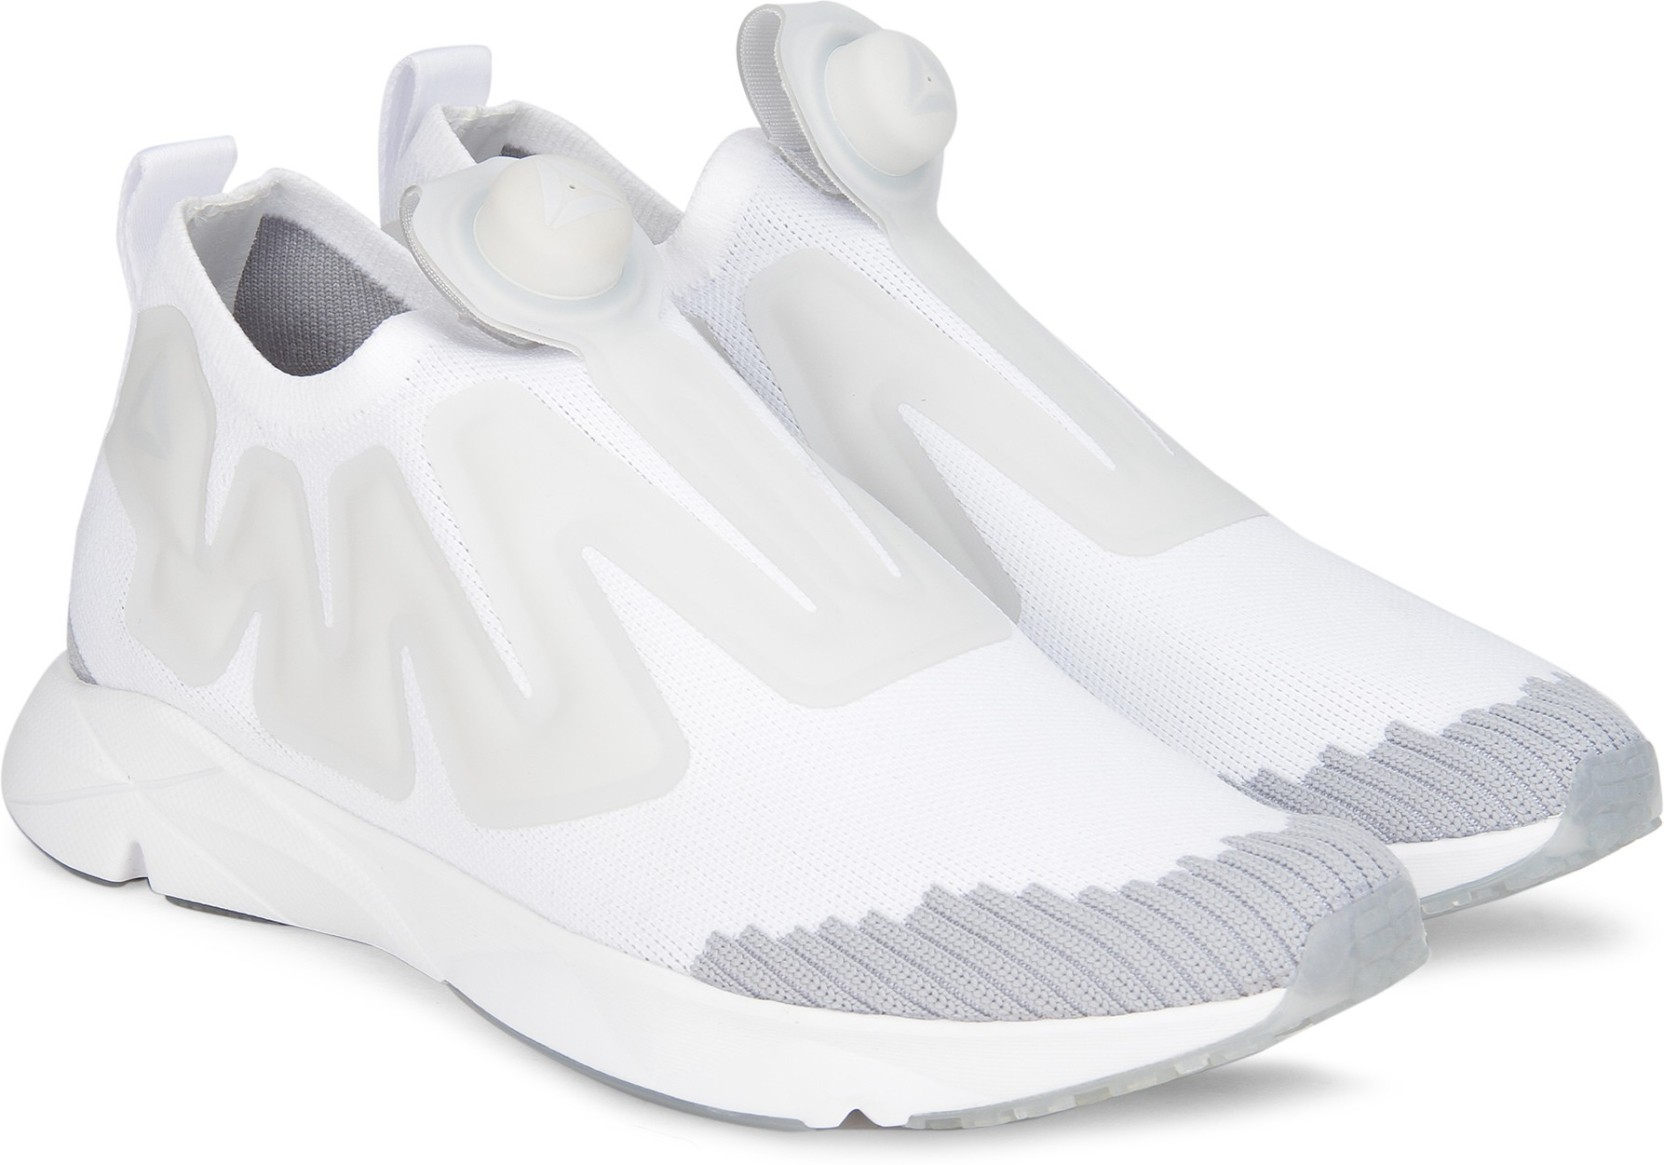 1ac865f24257 REEBOK PUMP SUPREME ULTK Running Shoes For Men - Buy WHITE CLOUD ...